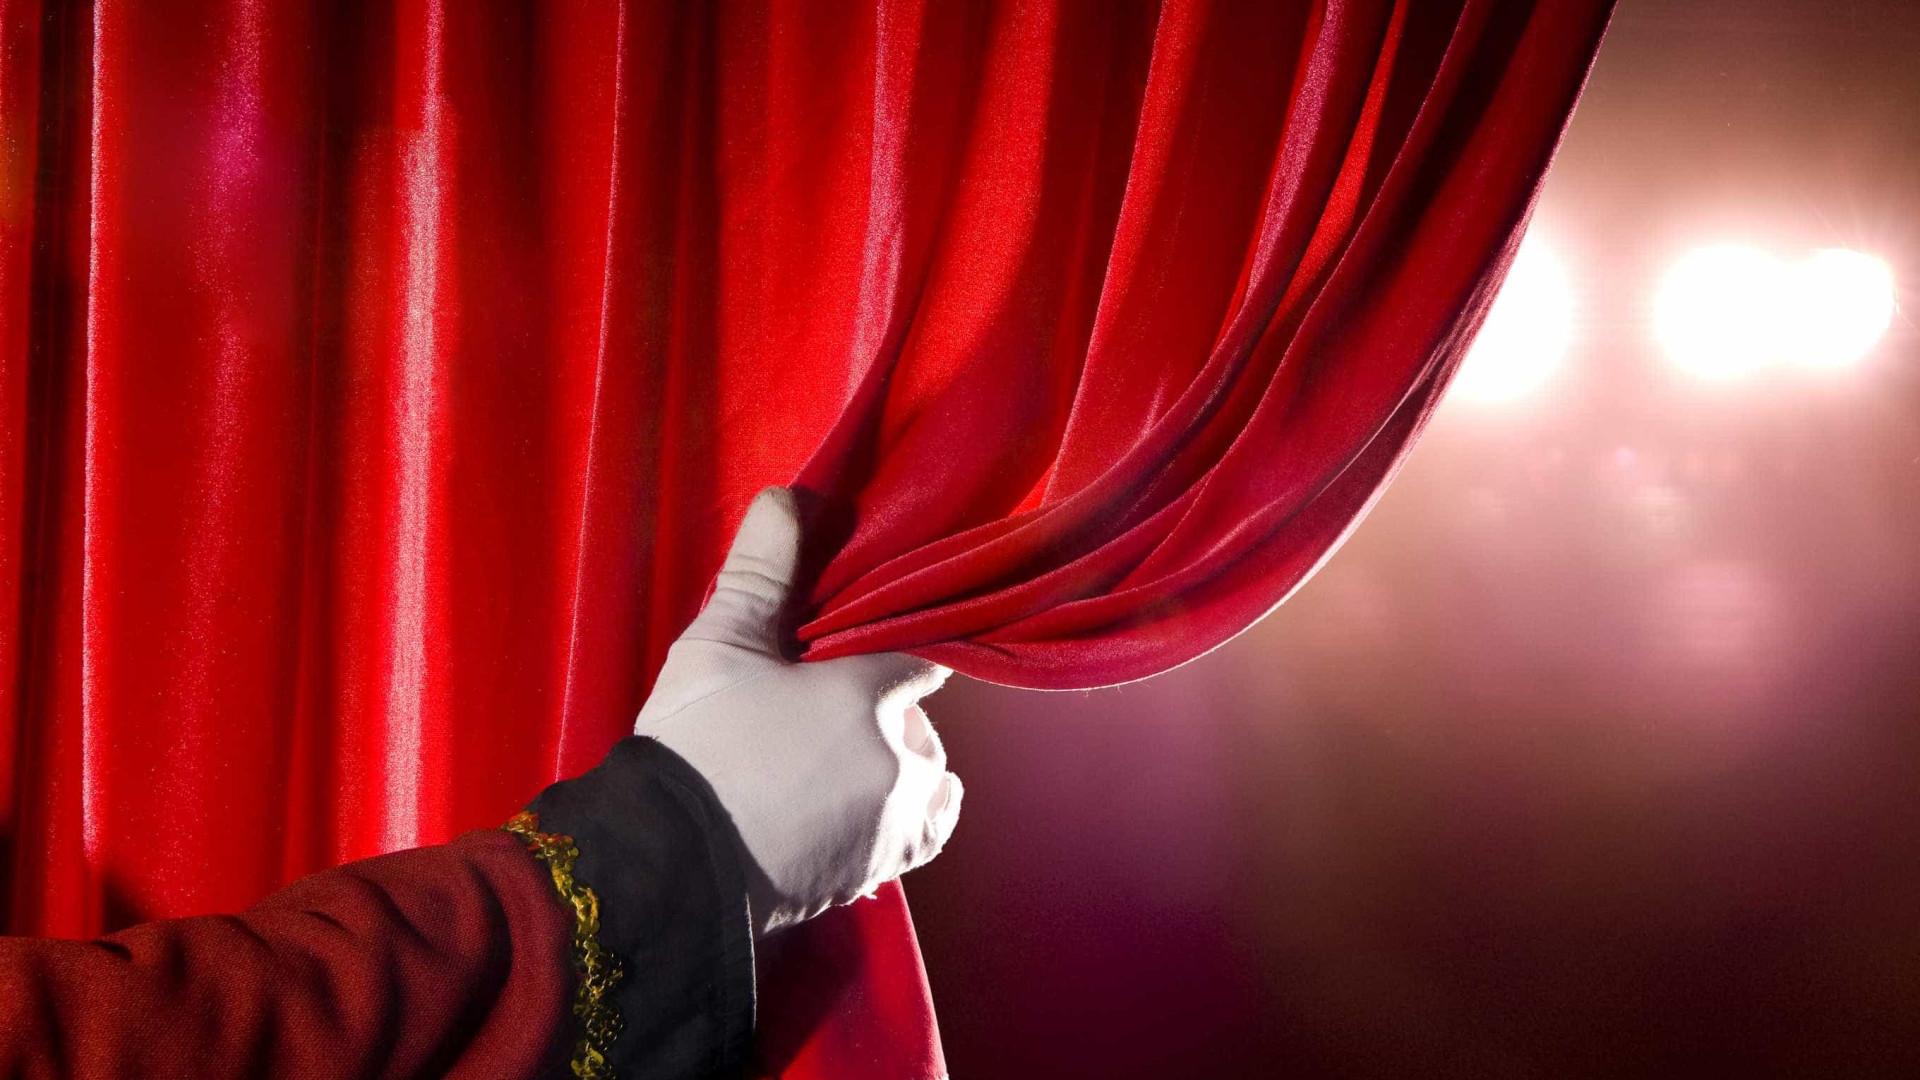 Teatro Praga leva 'Despertar da Primavera' ao Teatro Viriato em Viseu